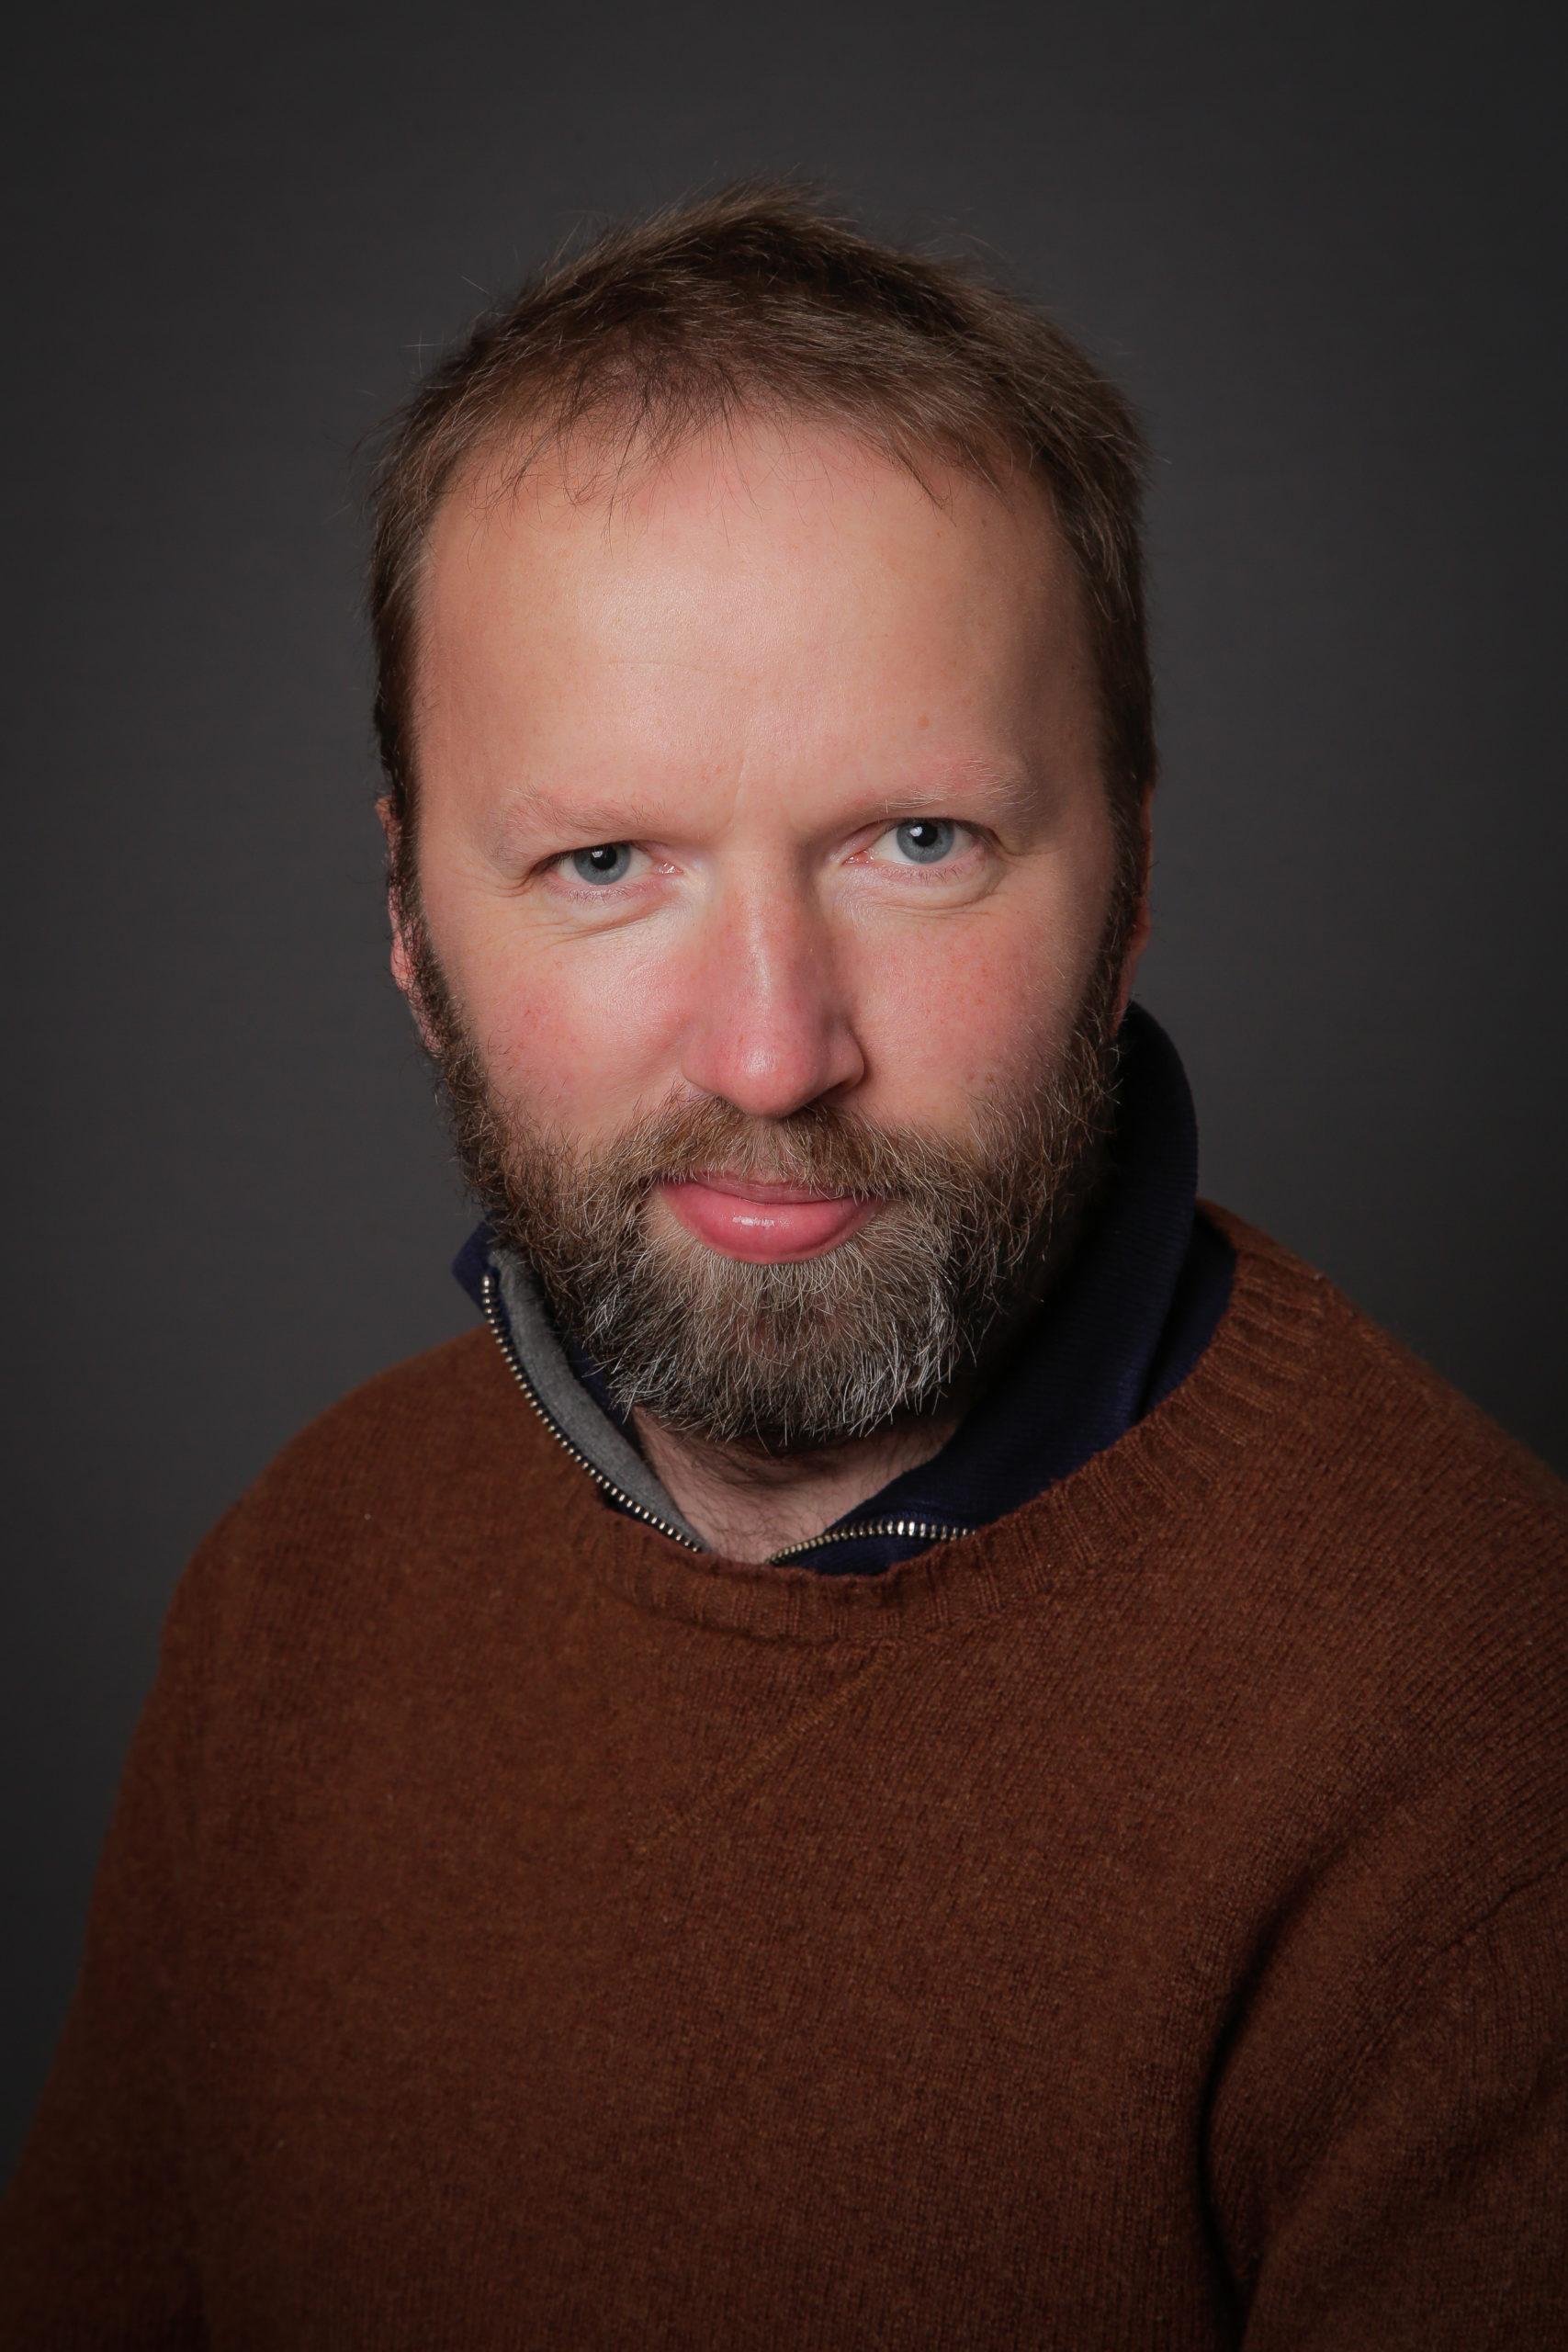 Arne Kristoffer Tynæs